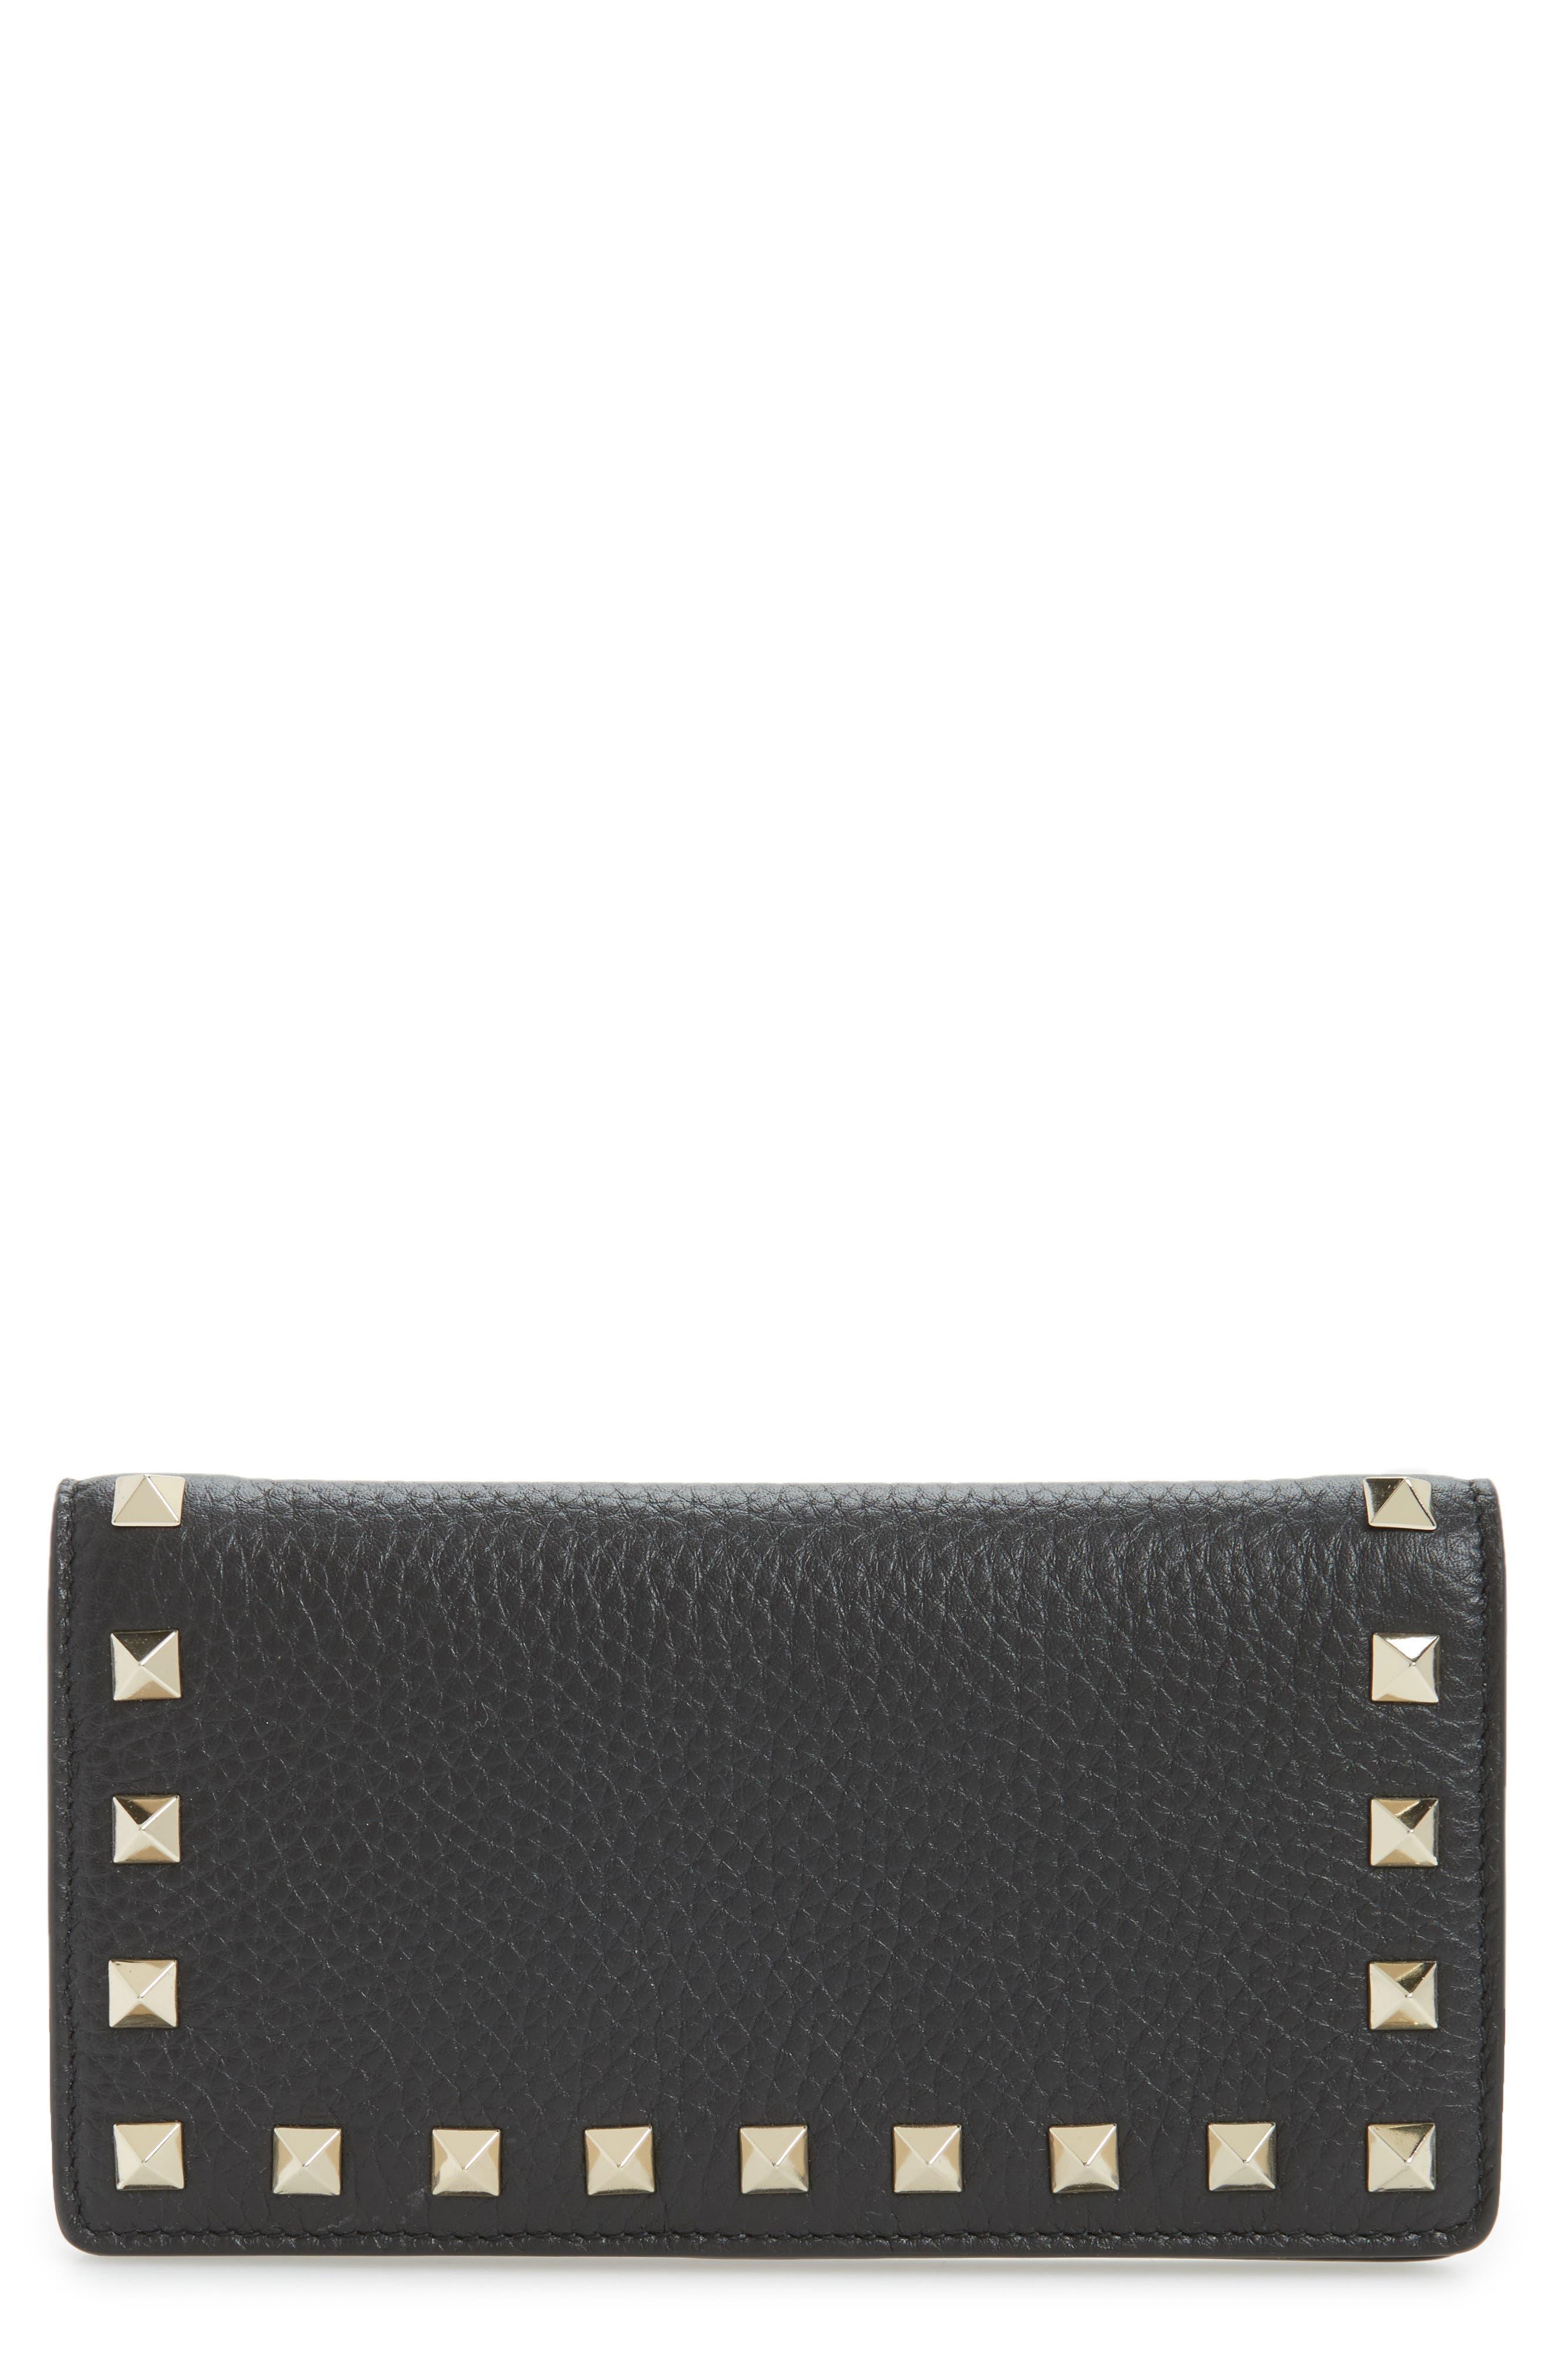 Main Image - VALENTINO GARAVANI Rockstud Calfskin Leather Wallet